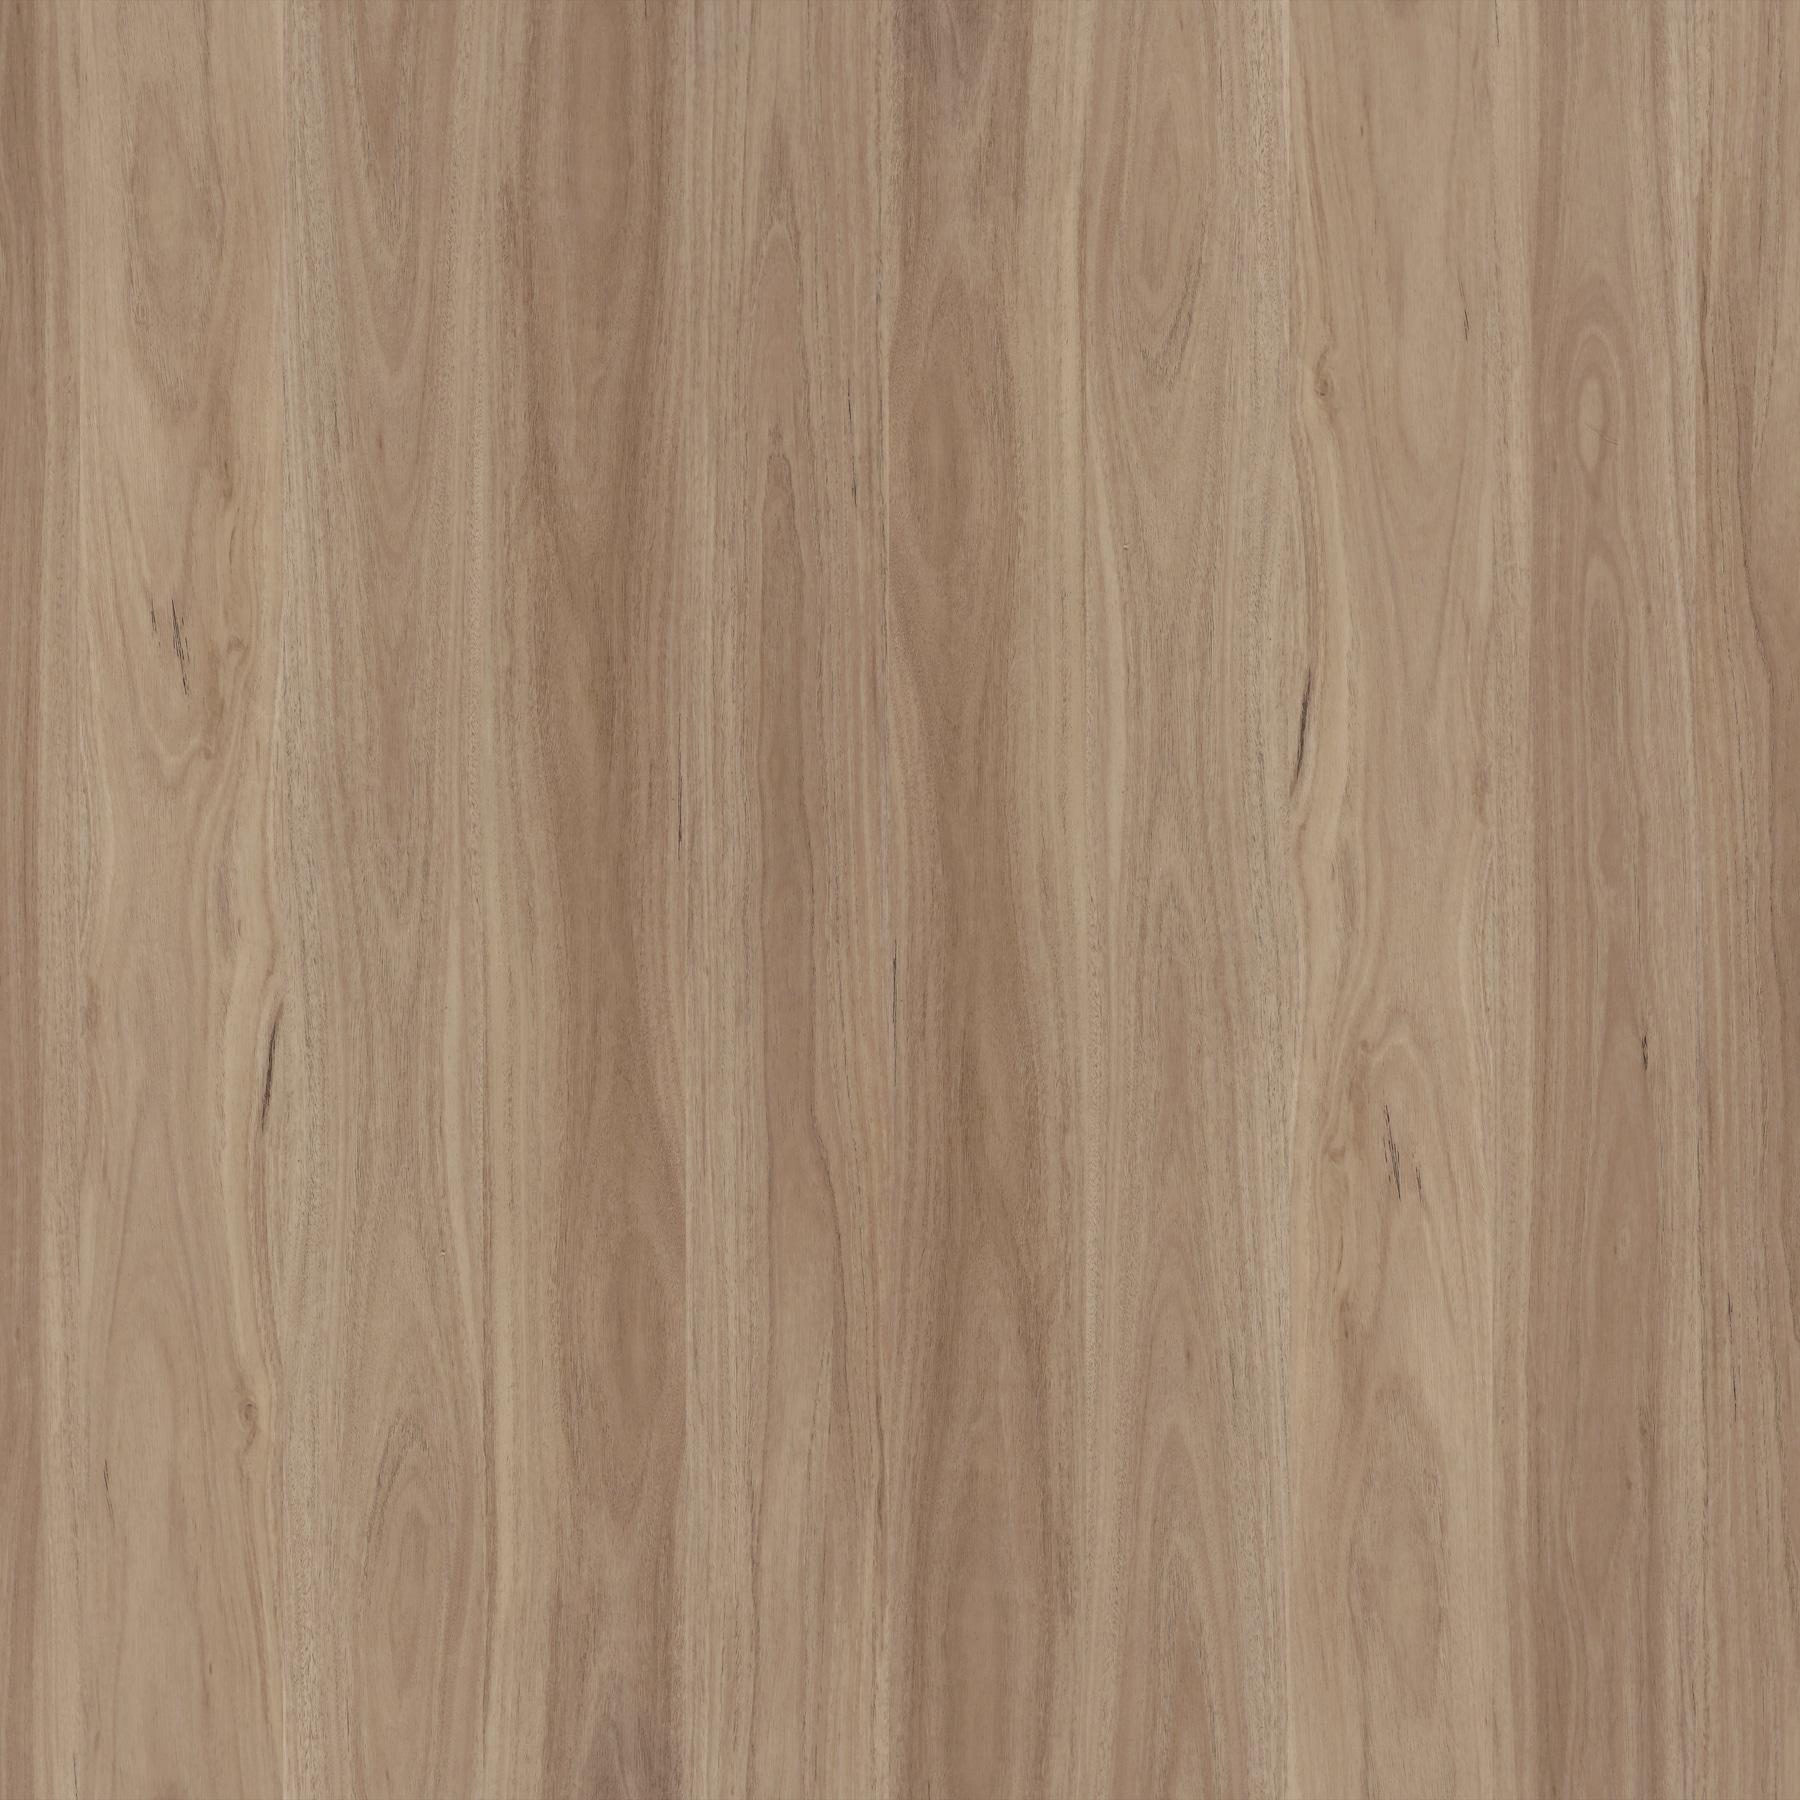 Topdeck Avala Hybrid Flooring Blackbutt - The Flooring Guys